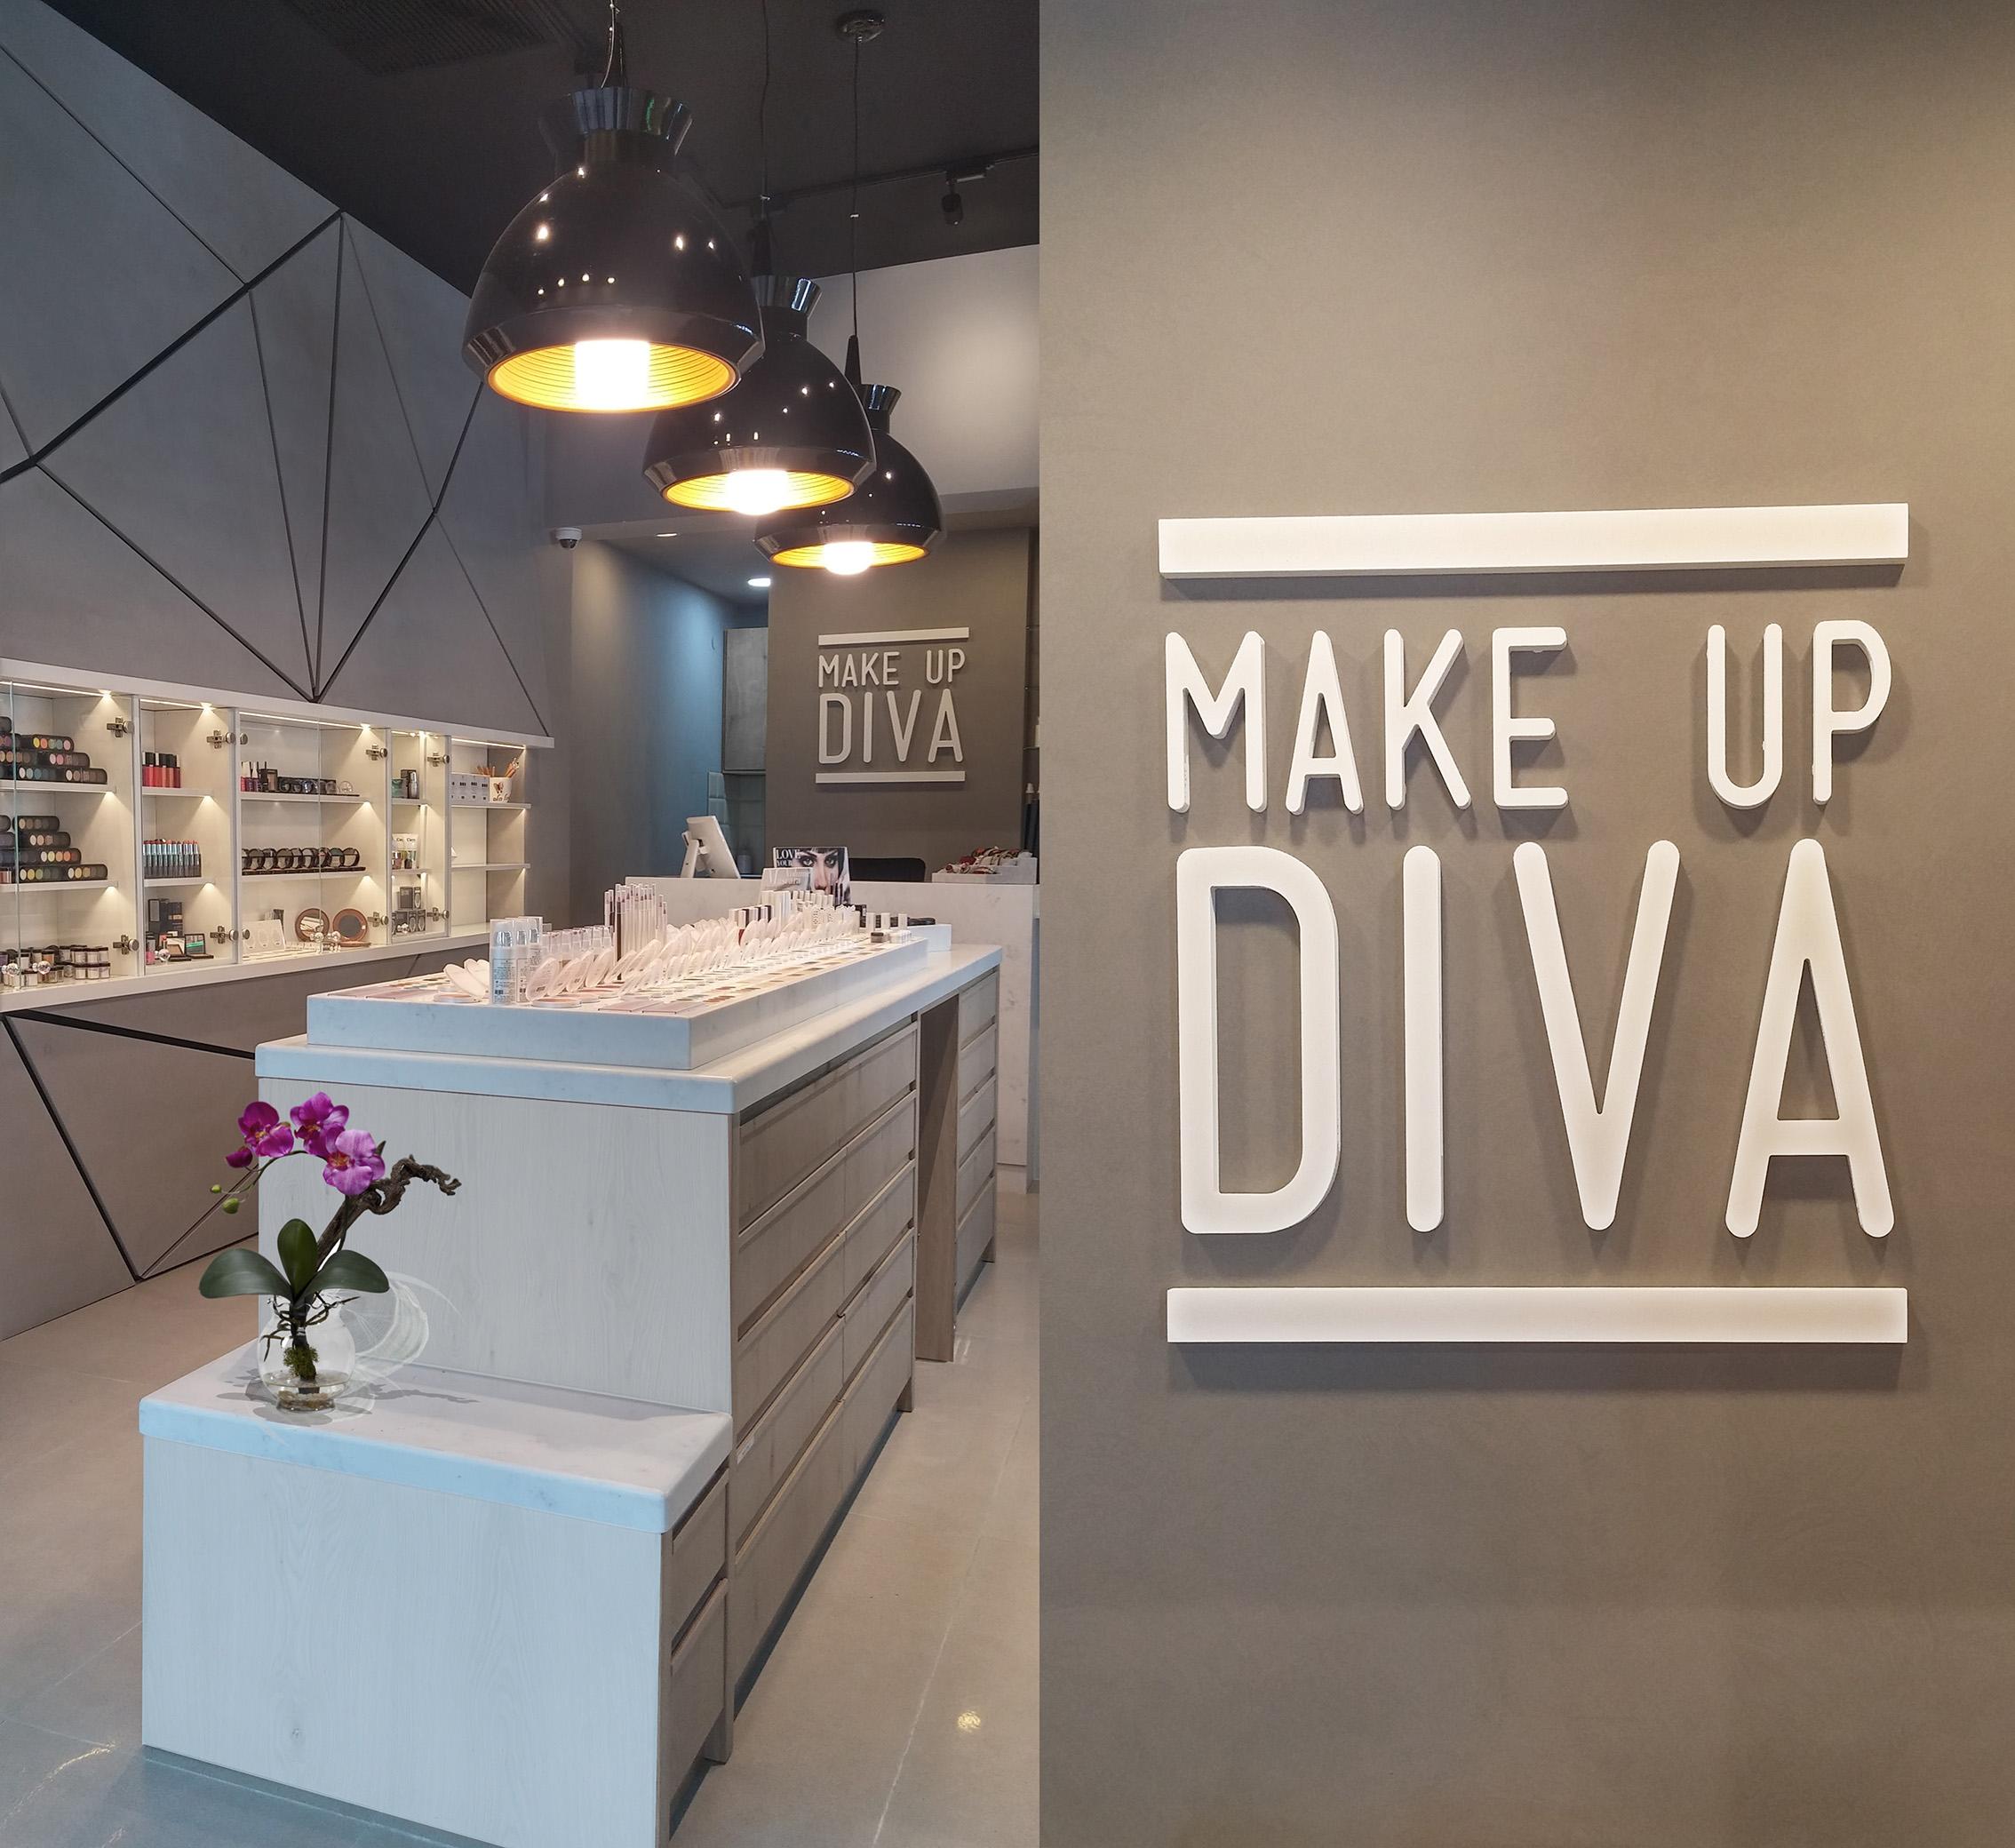 Make up diva